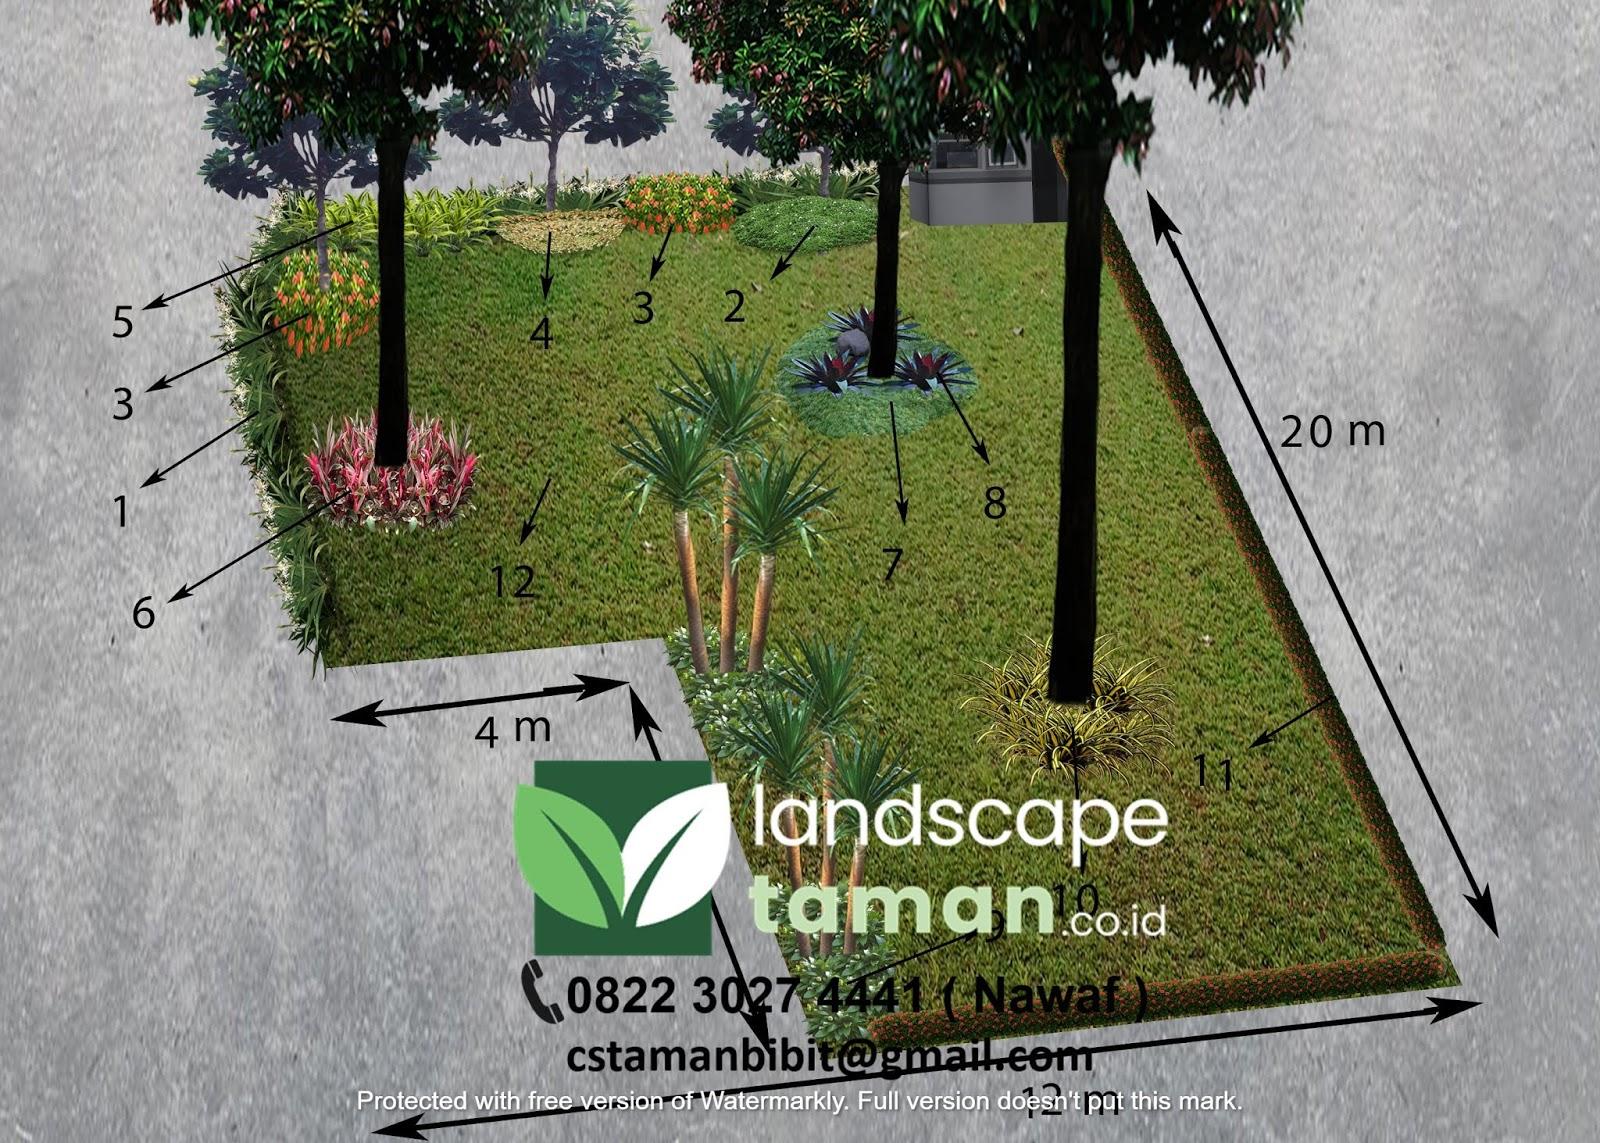 landscape https://landscapetaman.co.id/